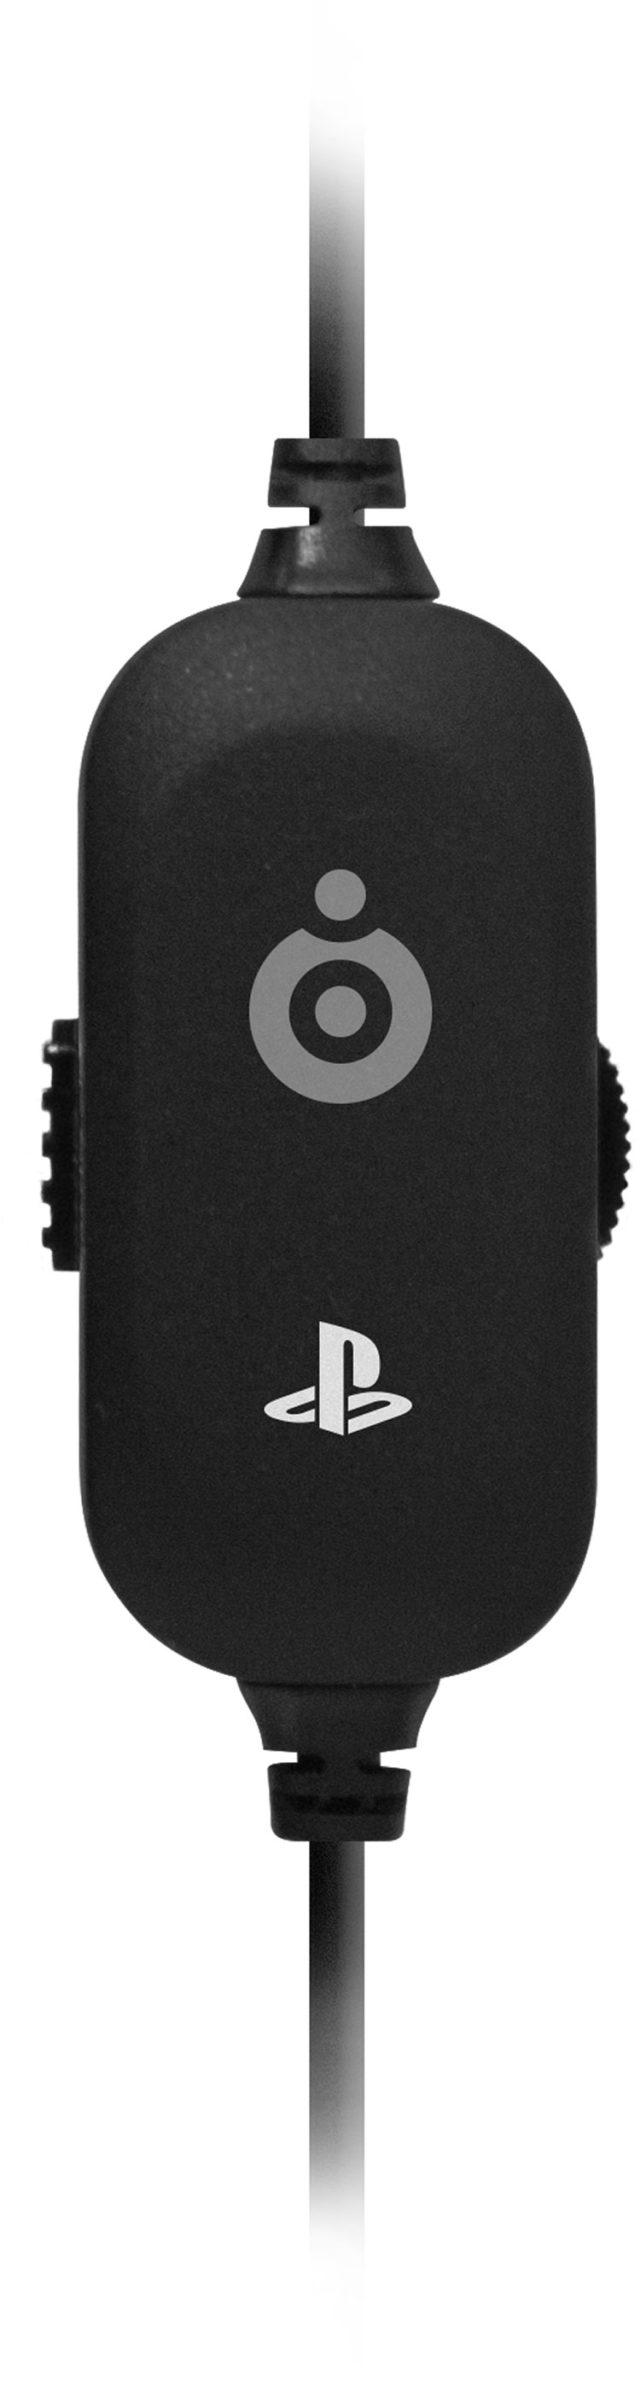 Casque jeu SONY PS4 – Visuel#1